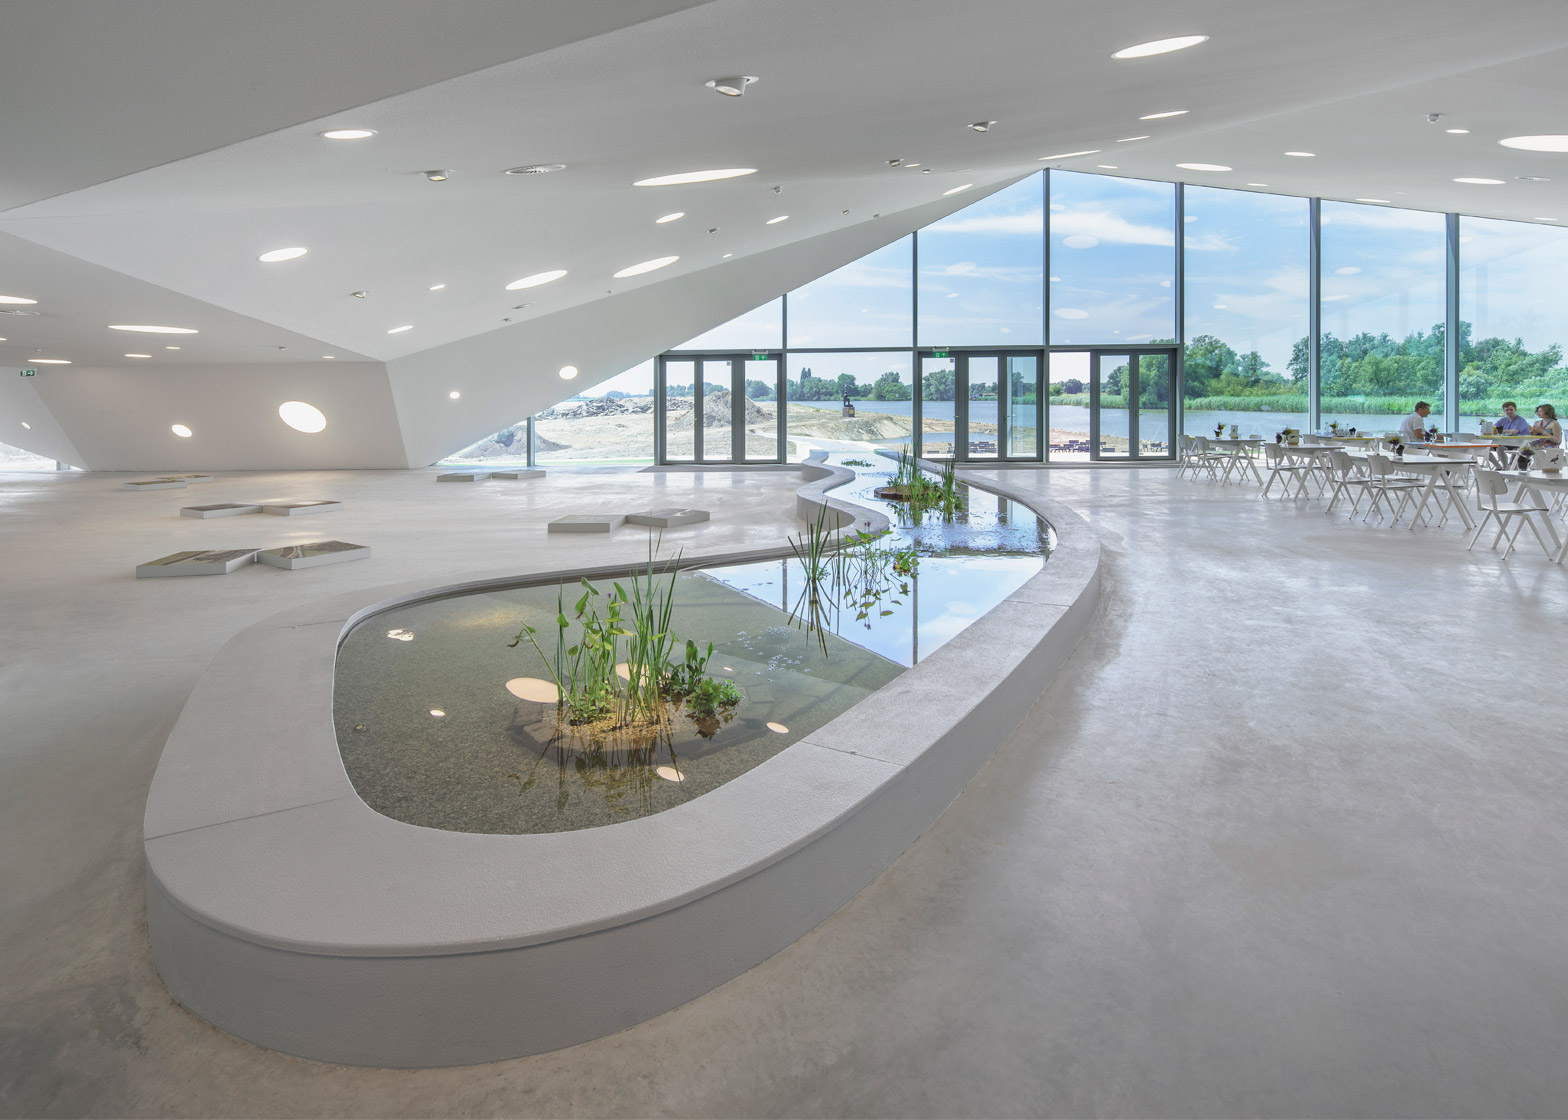 Biesbosch Museum Island by Studio Marco Vermeulen